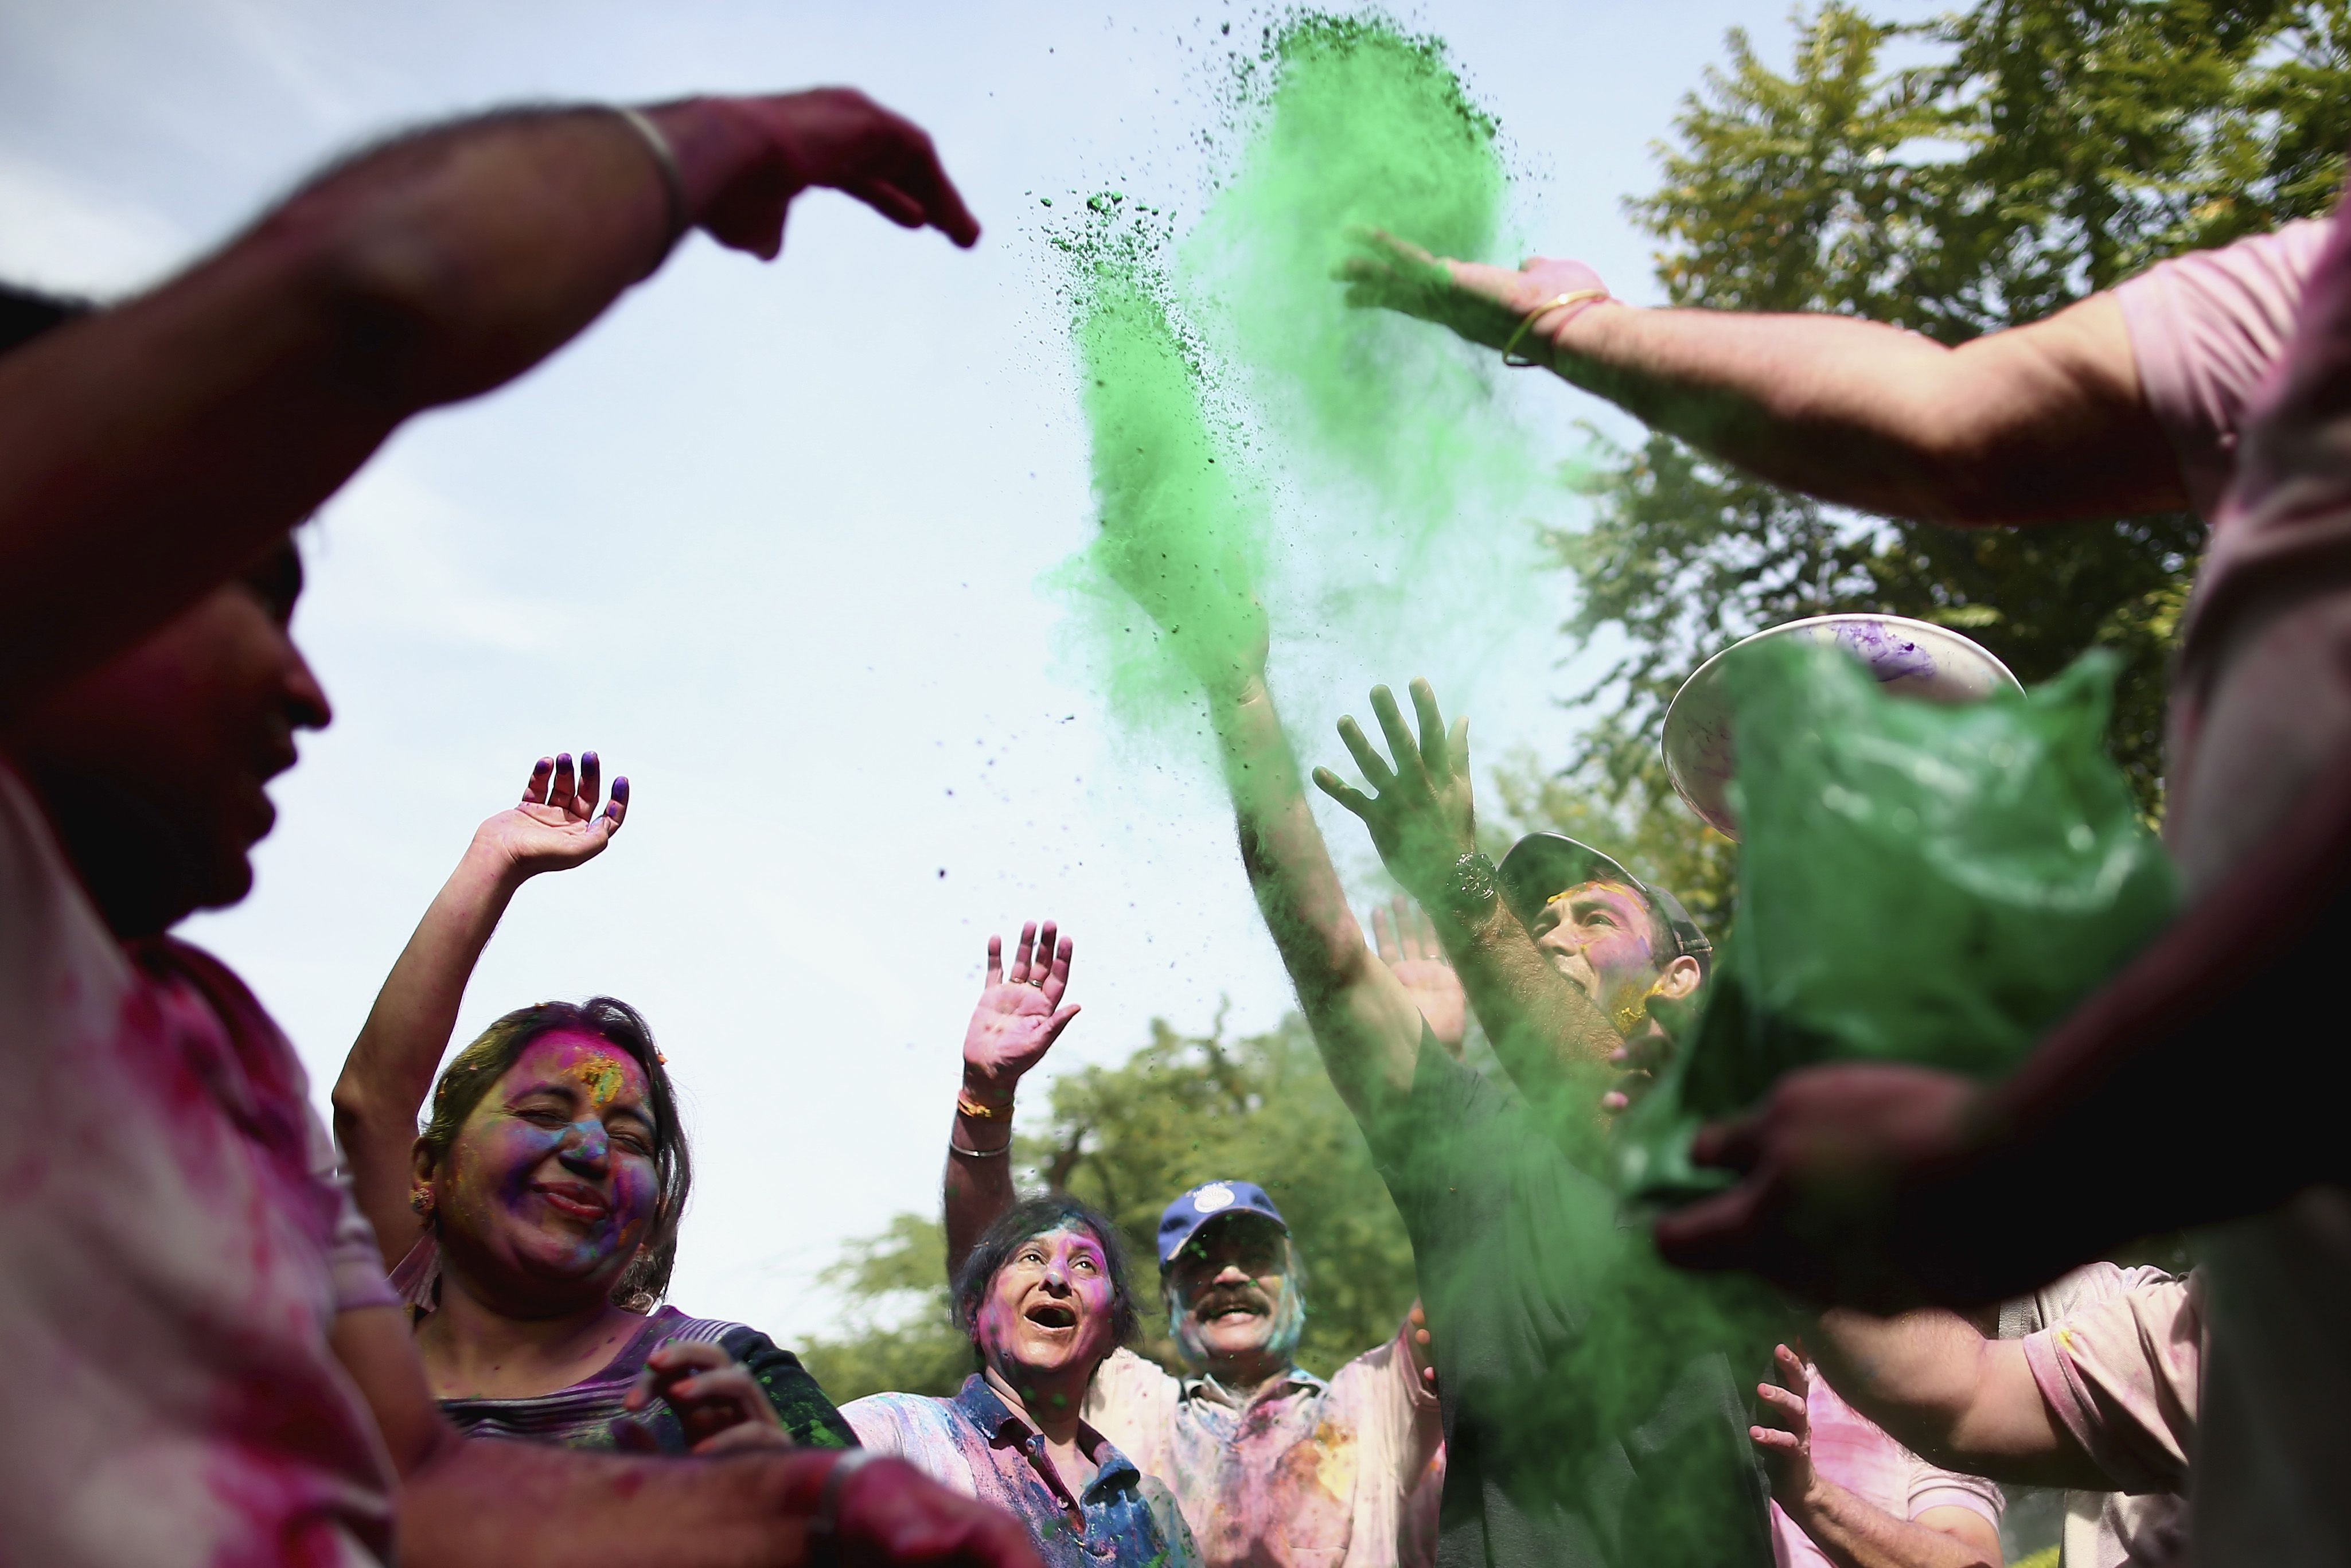 Holi Festival in Chandigarh, India